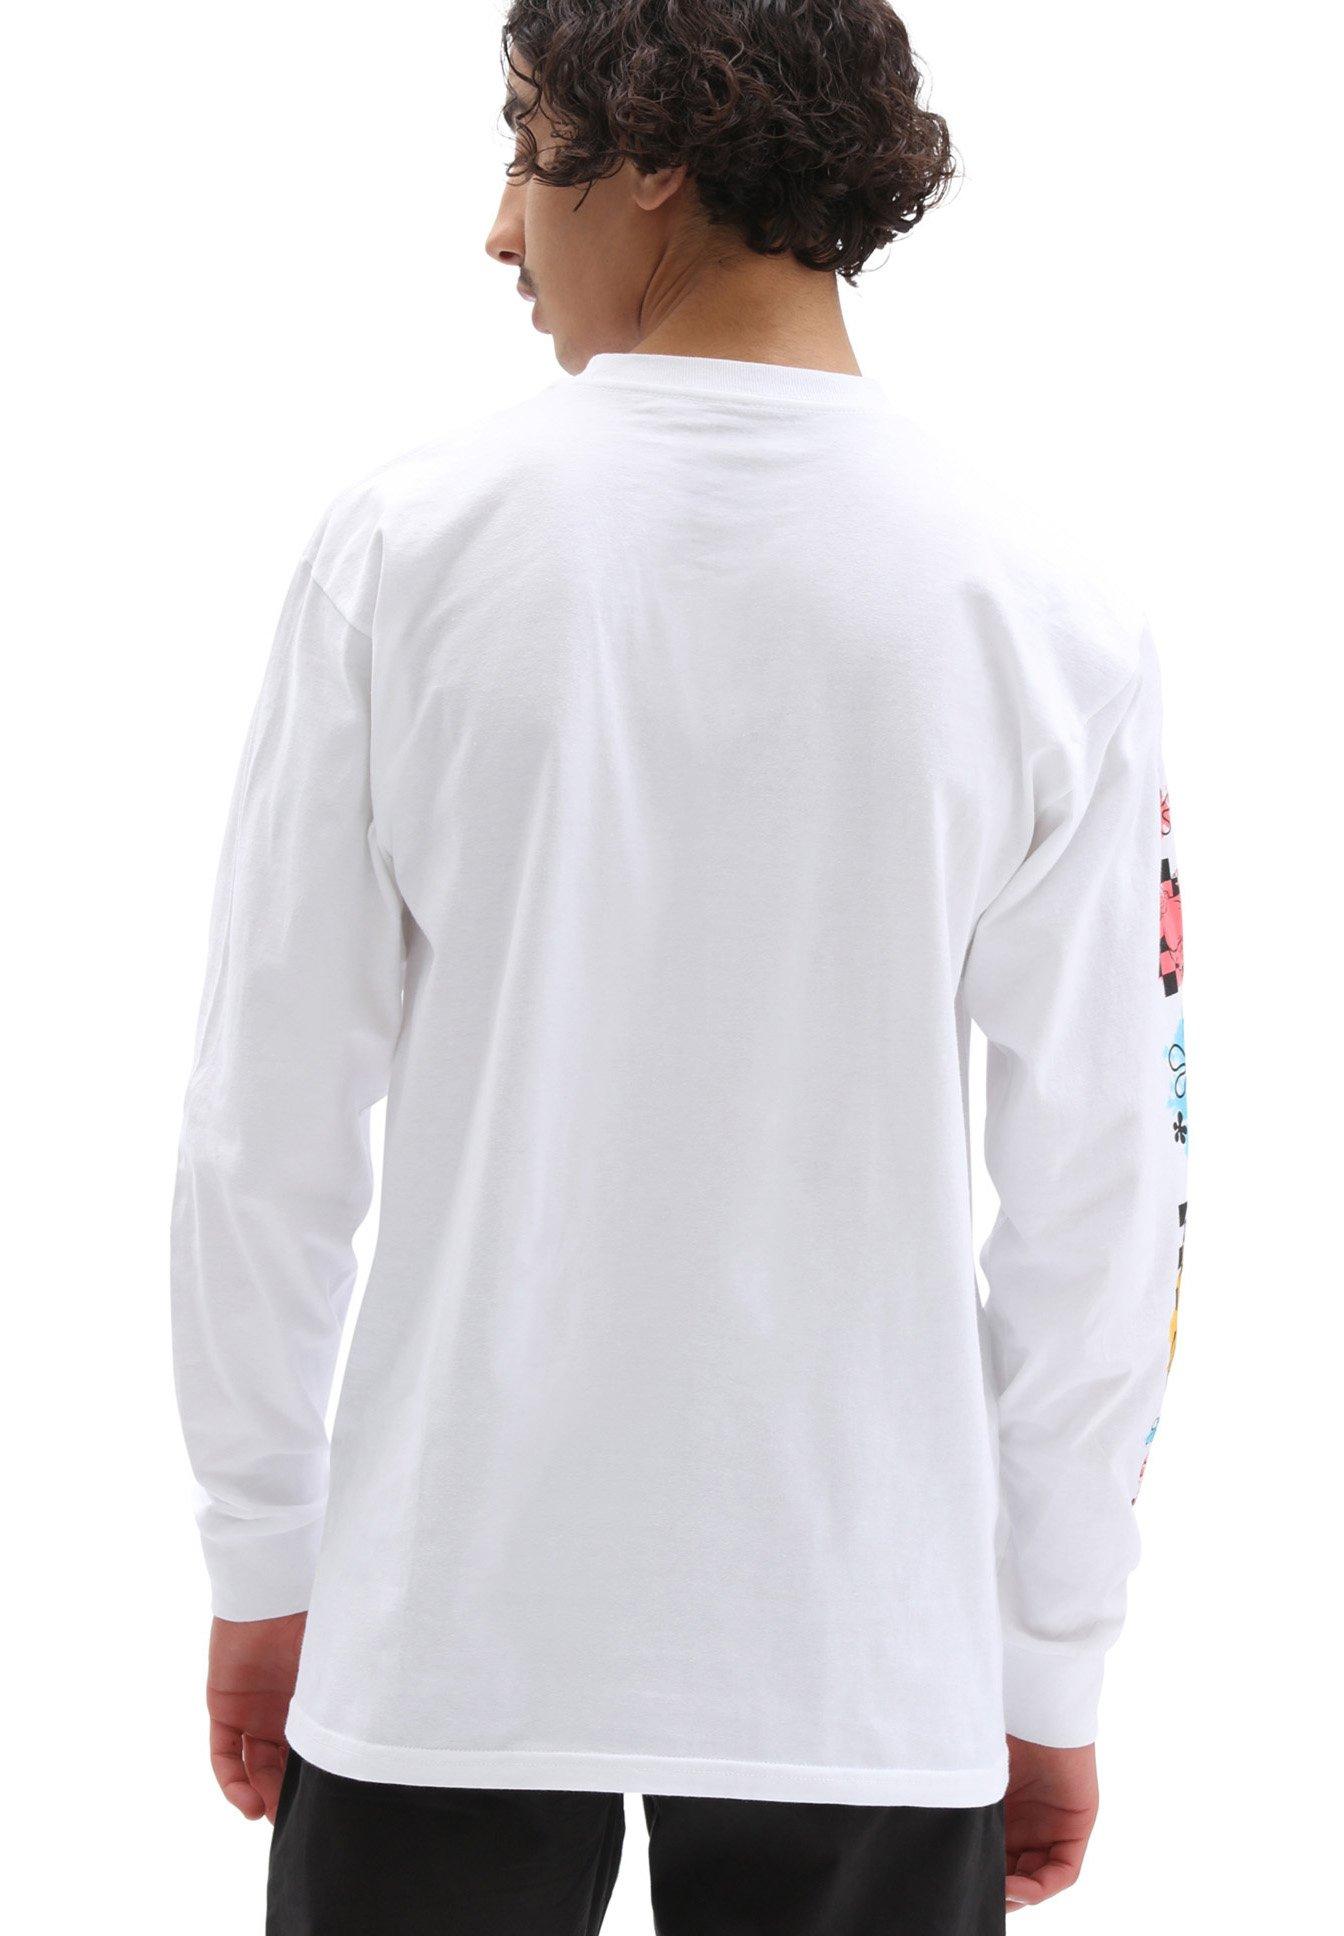 Uomo MN VANS X SPONGEBOB AIRBRUSH LS - Maglietta a manica lunga